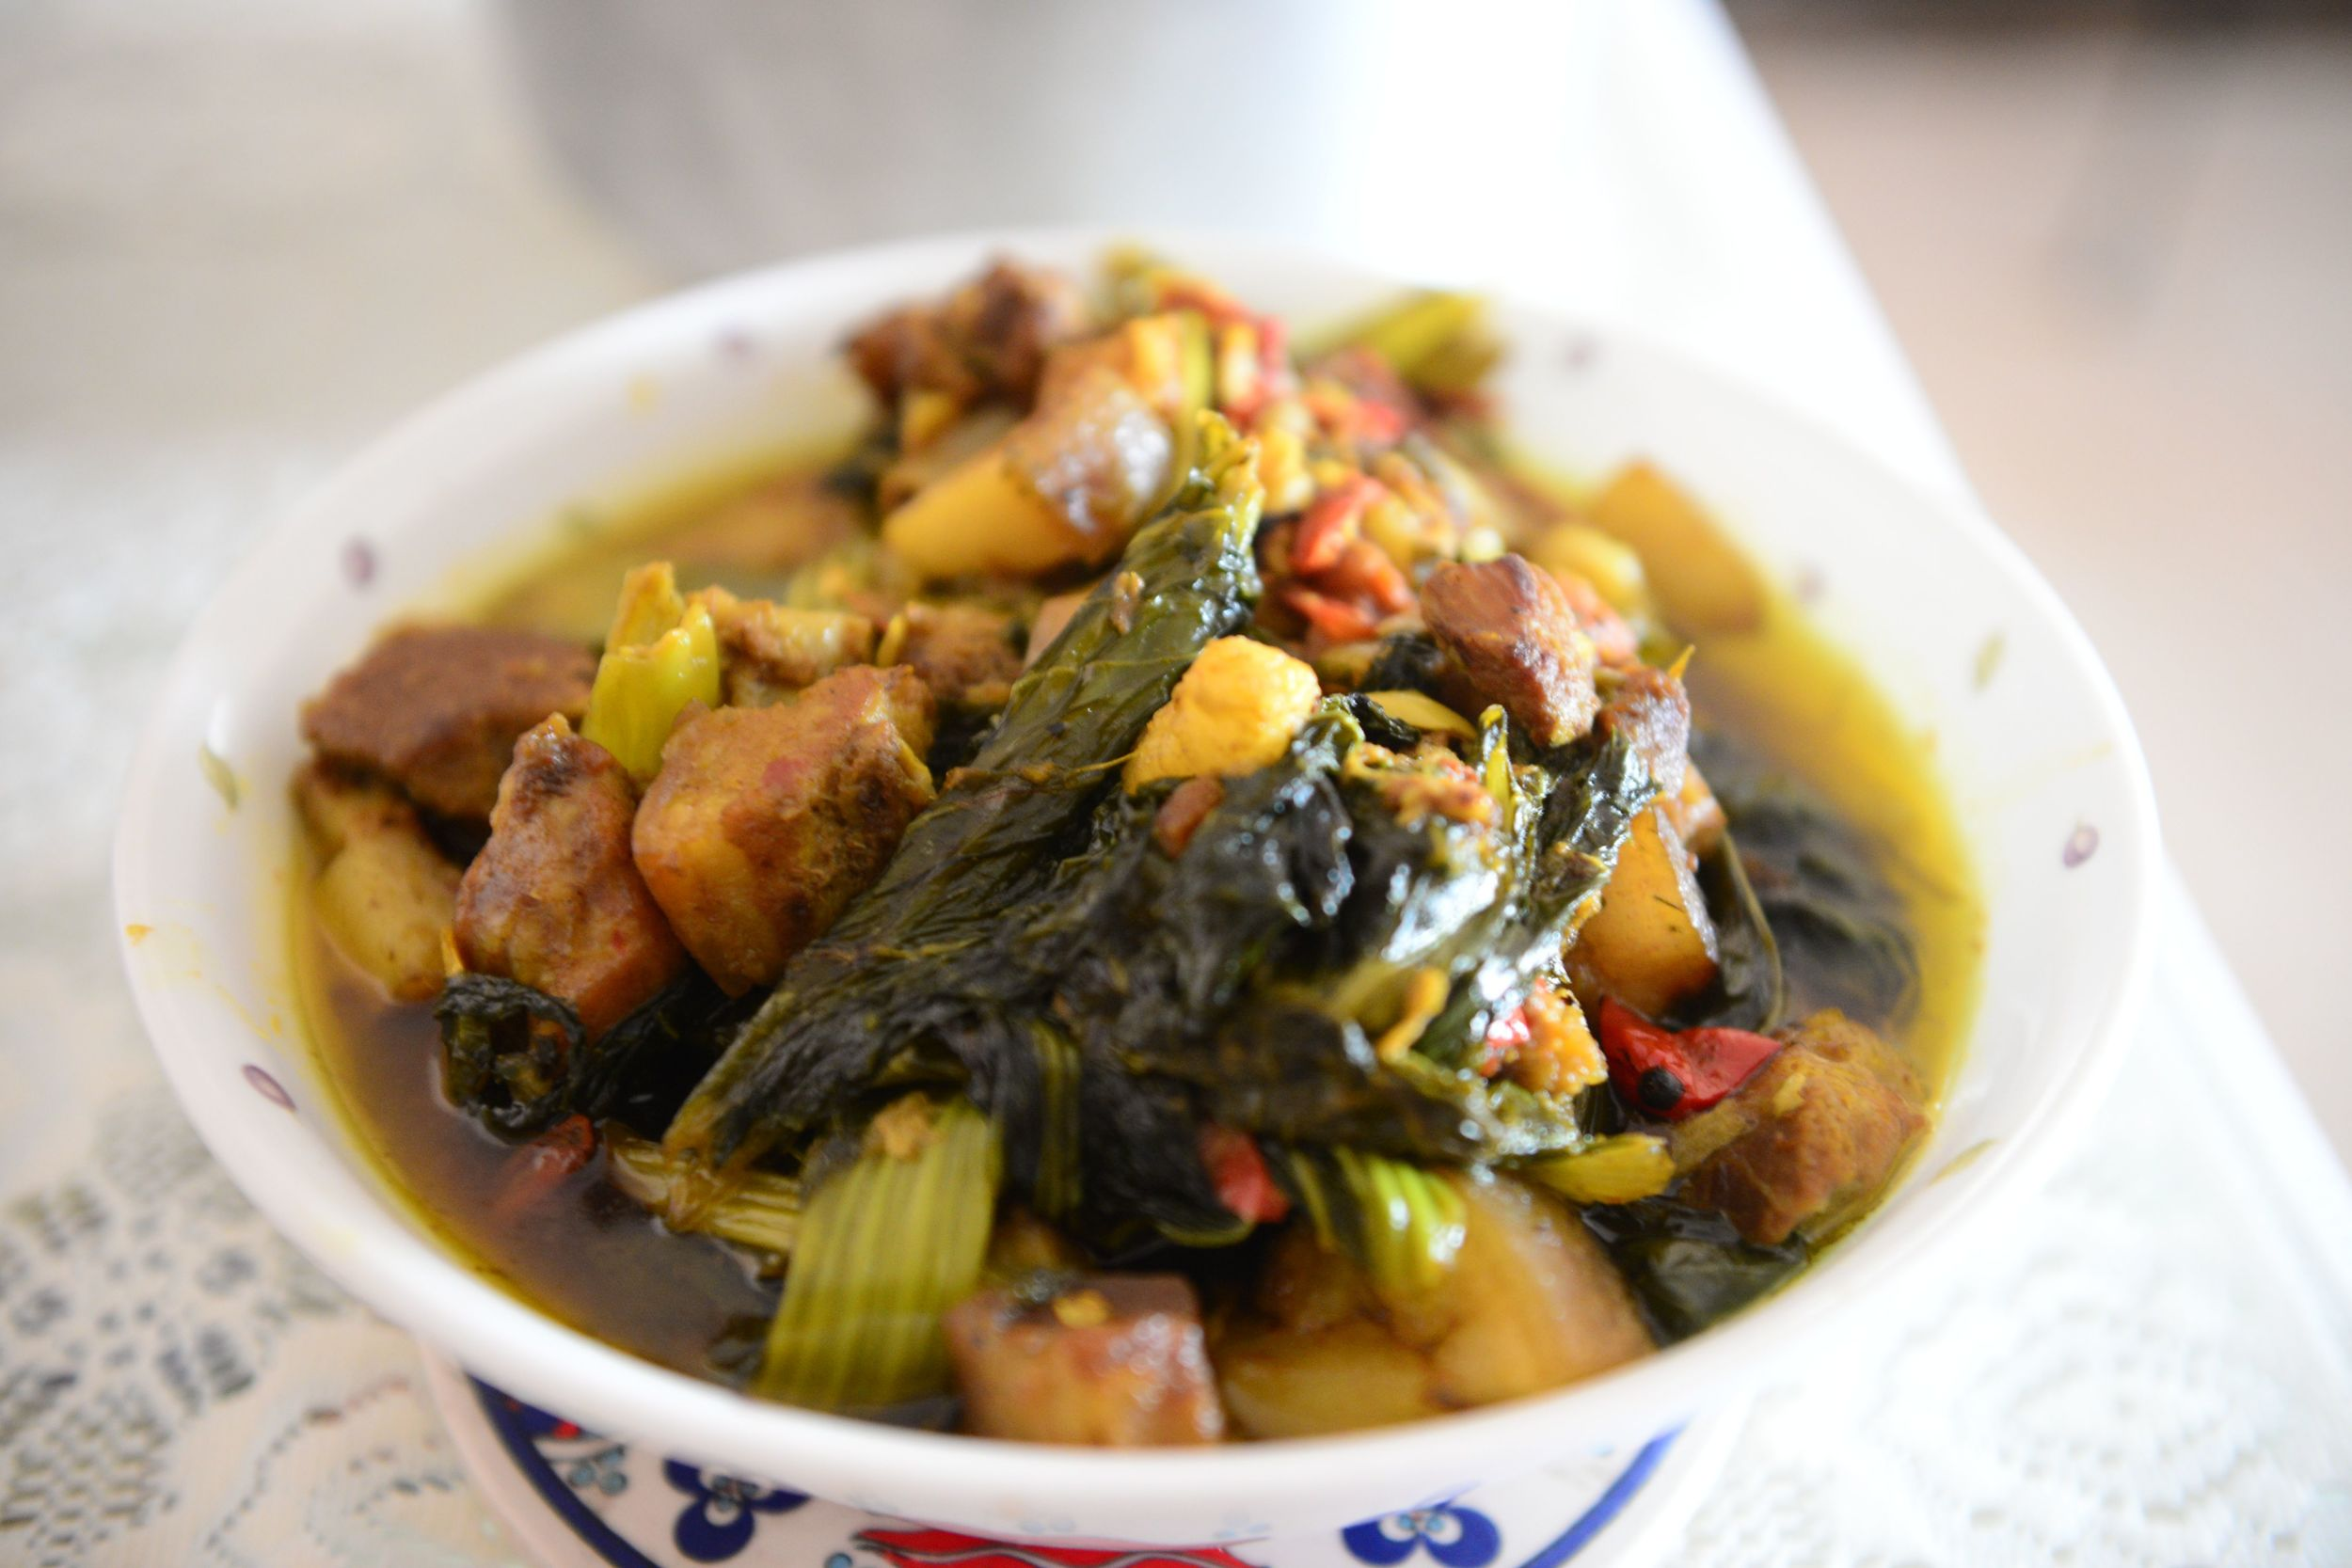 Lai Xaak aru Gahori (pork with mustard greens)